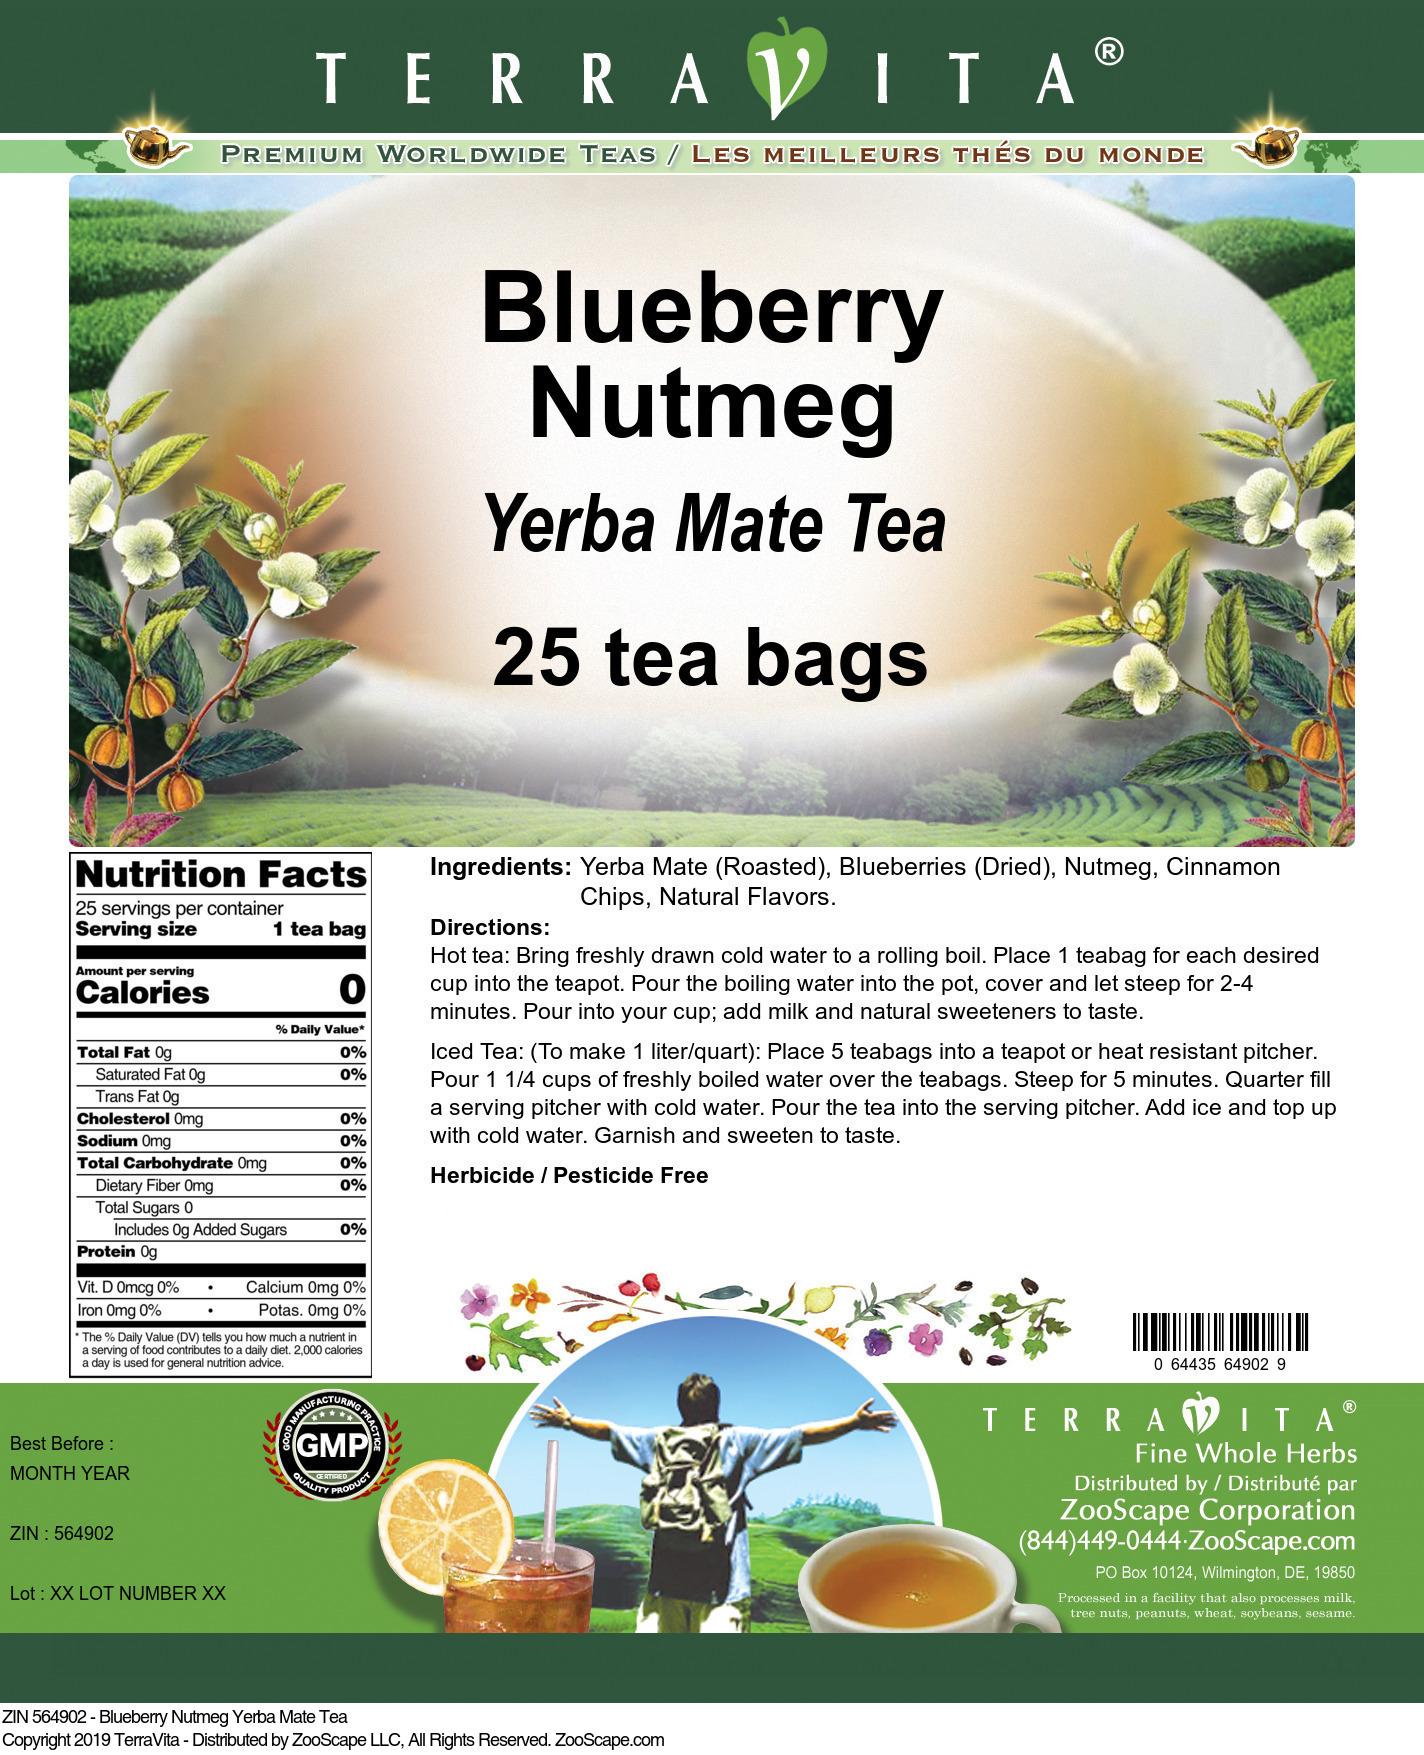 Blueberry Nutmeg Yerba Mate